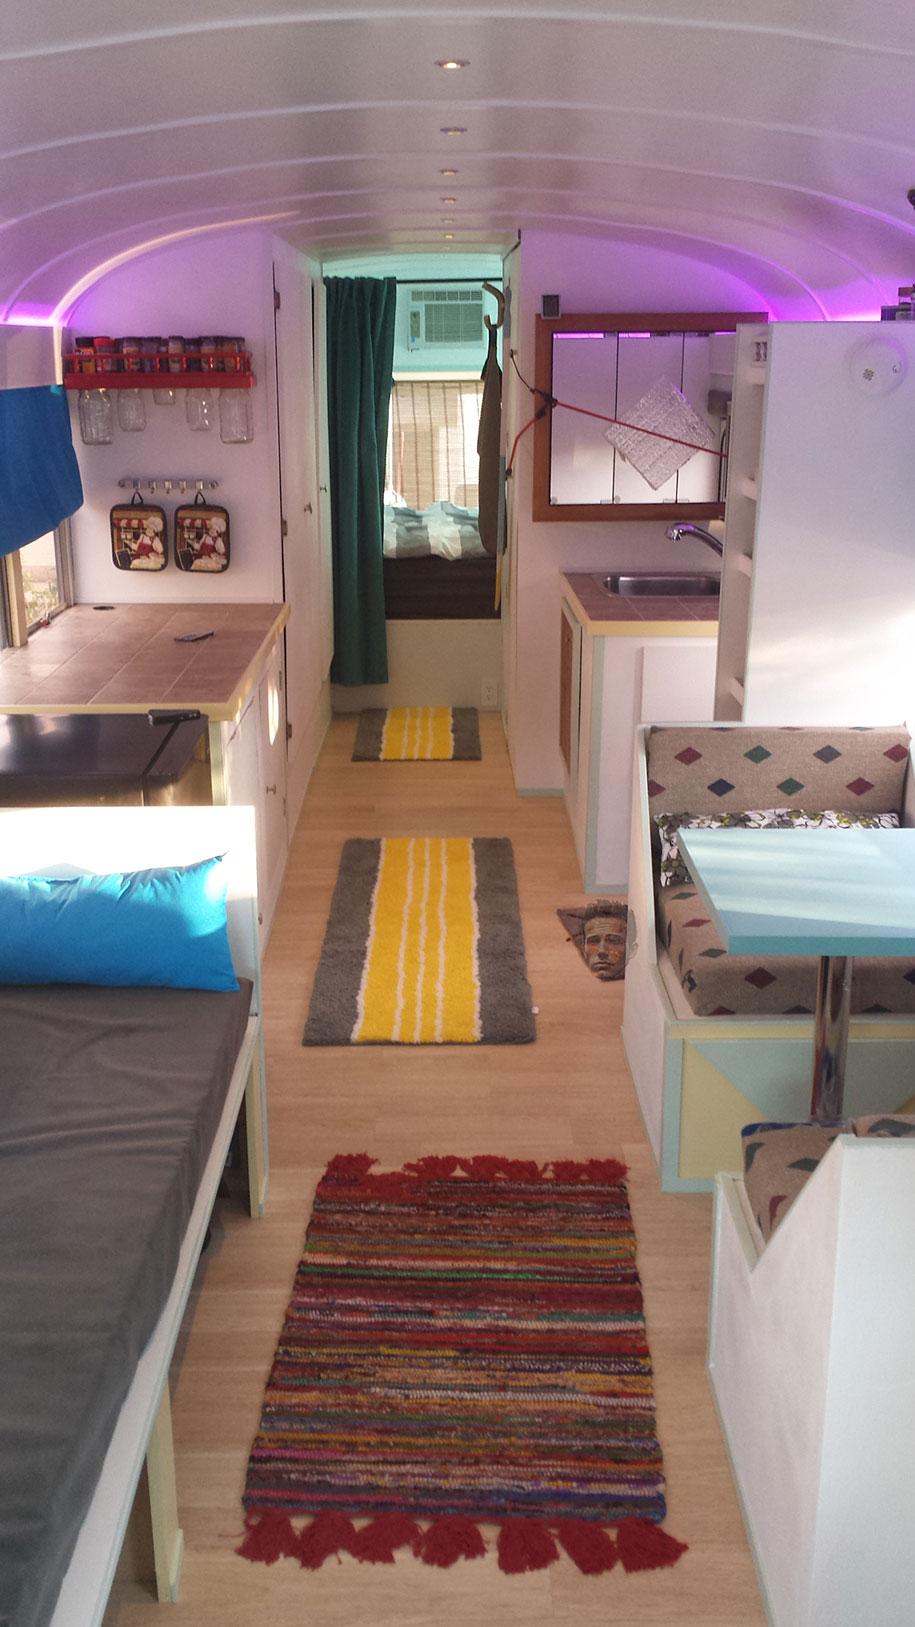 mobile-school-bus-home-travel-patrick-schmidt-7